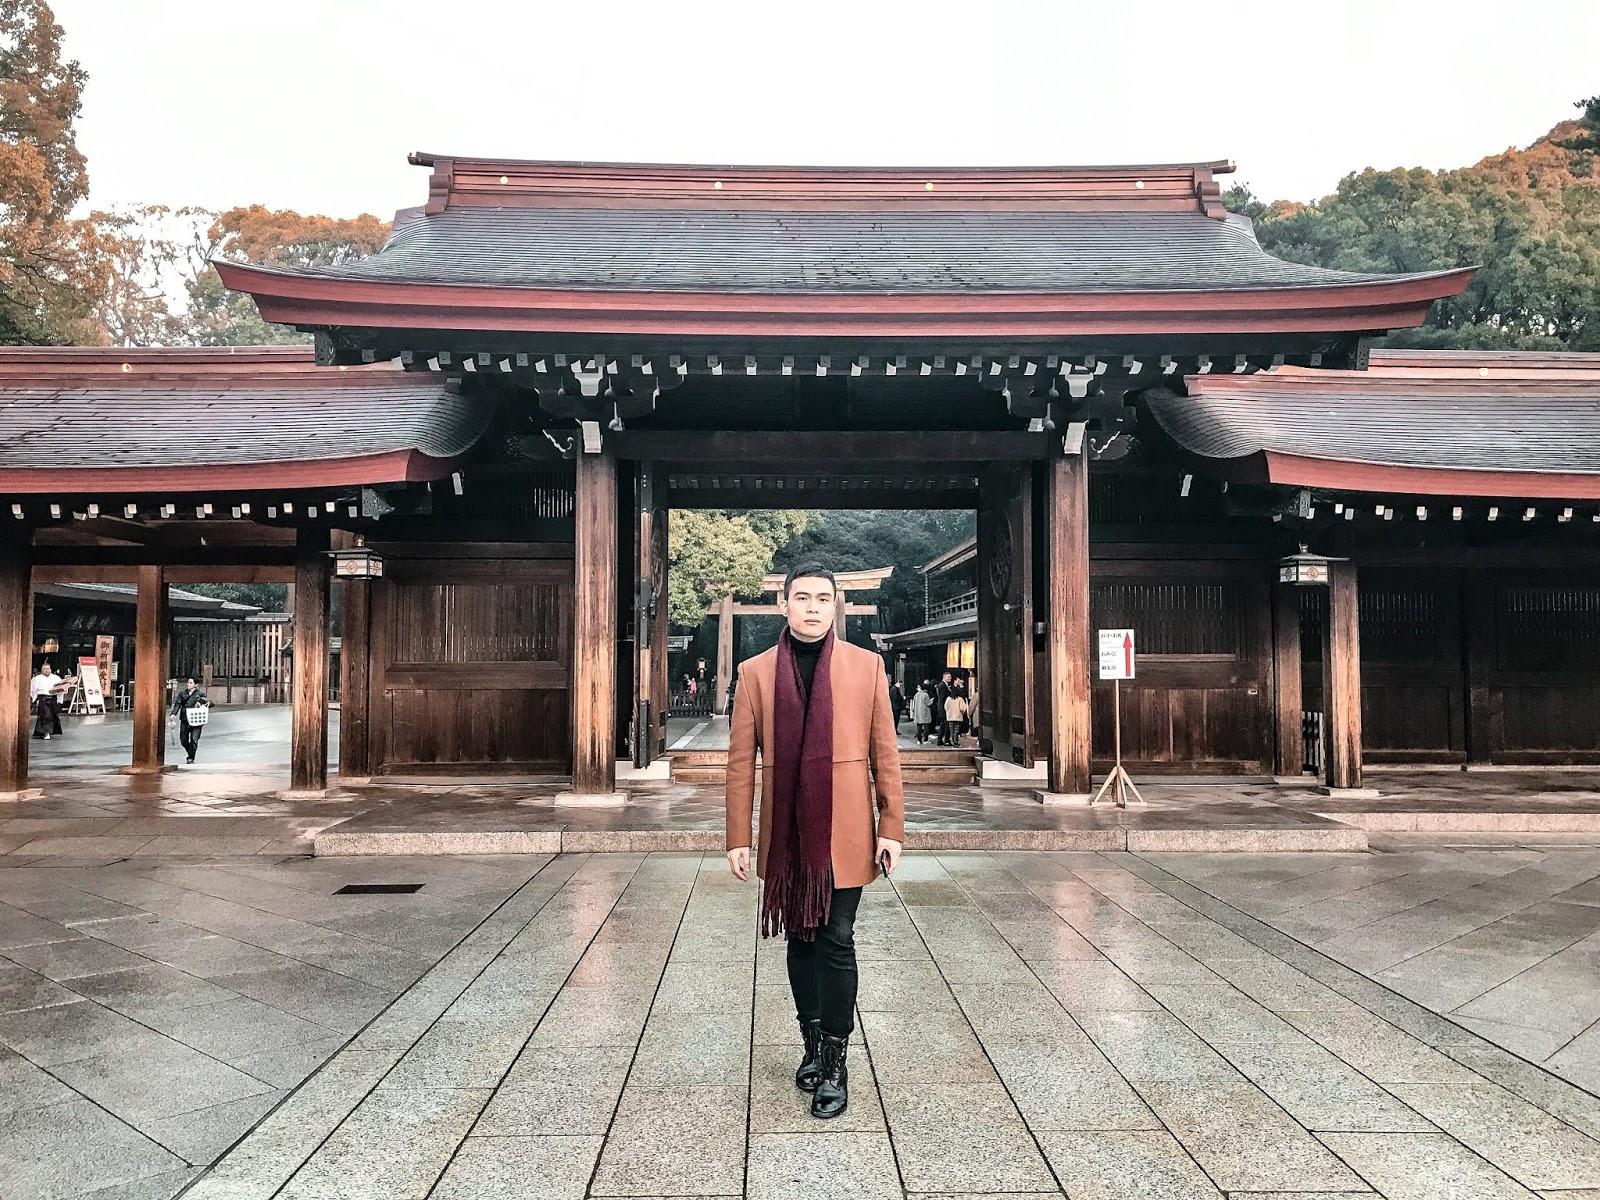 Tokyo Yoyogi Park and Meiji Jingu Shrine, Yoyogi Park, what to do in Tokyo, Japan travel guide, thedailyposh, the posh traveler, travel guide in Tokyo,